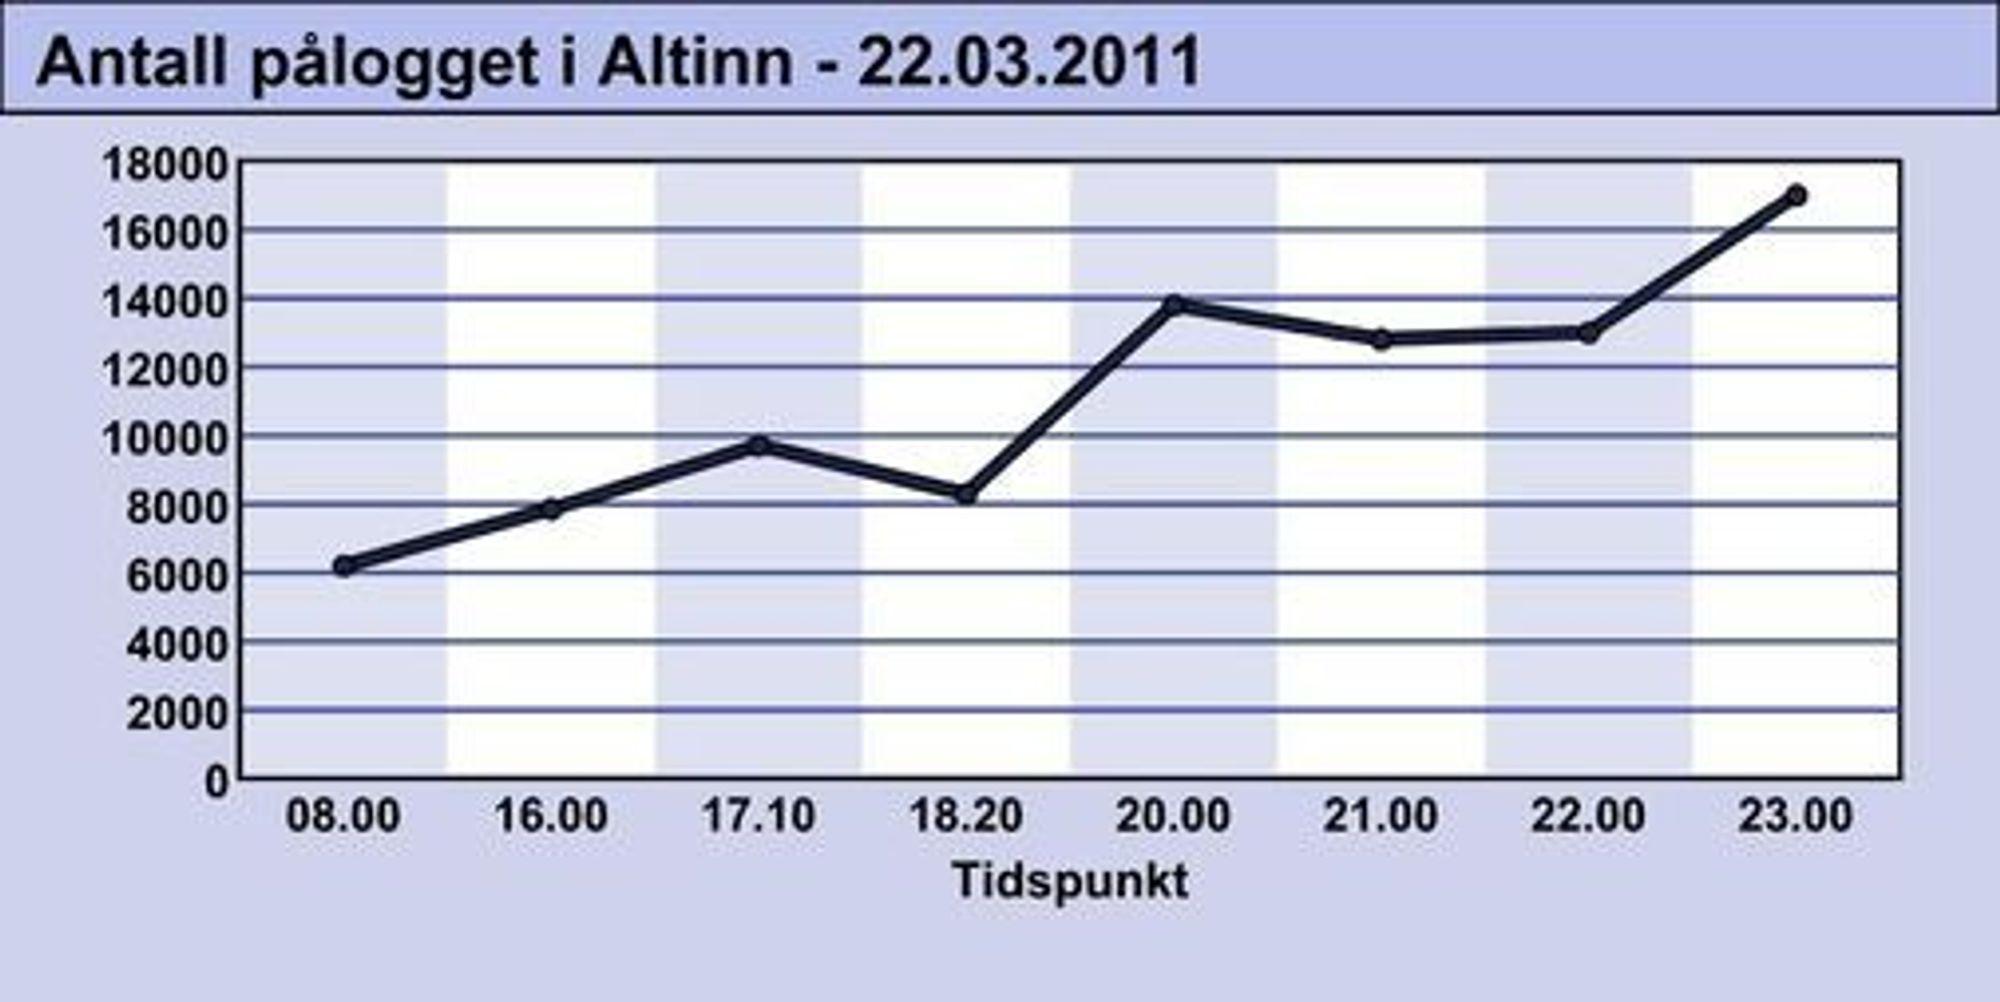 Grafen viser hvor mange som var pålogget Altinn til utvalgte tidspunkter 22. mars 2011.